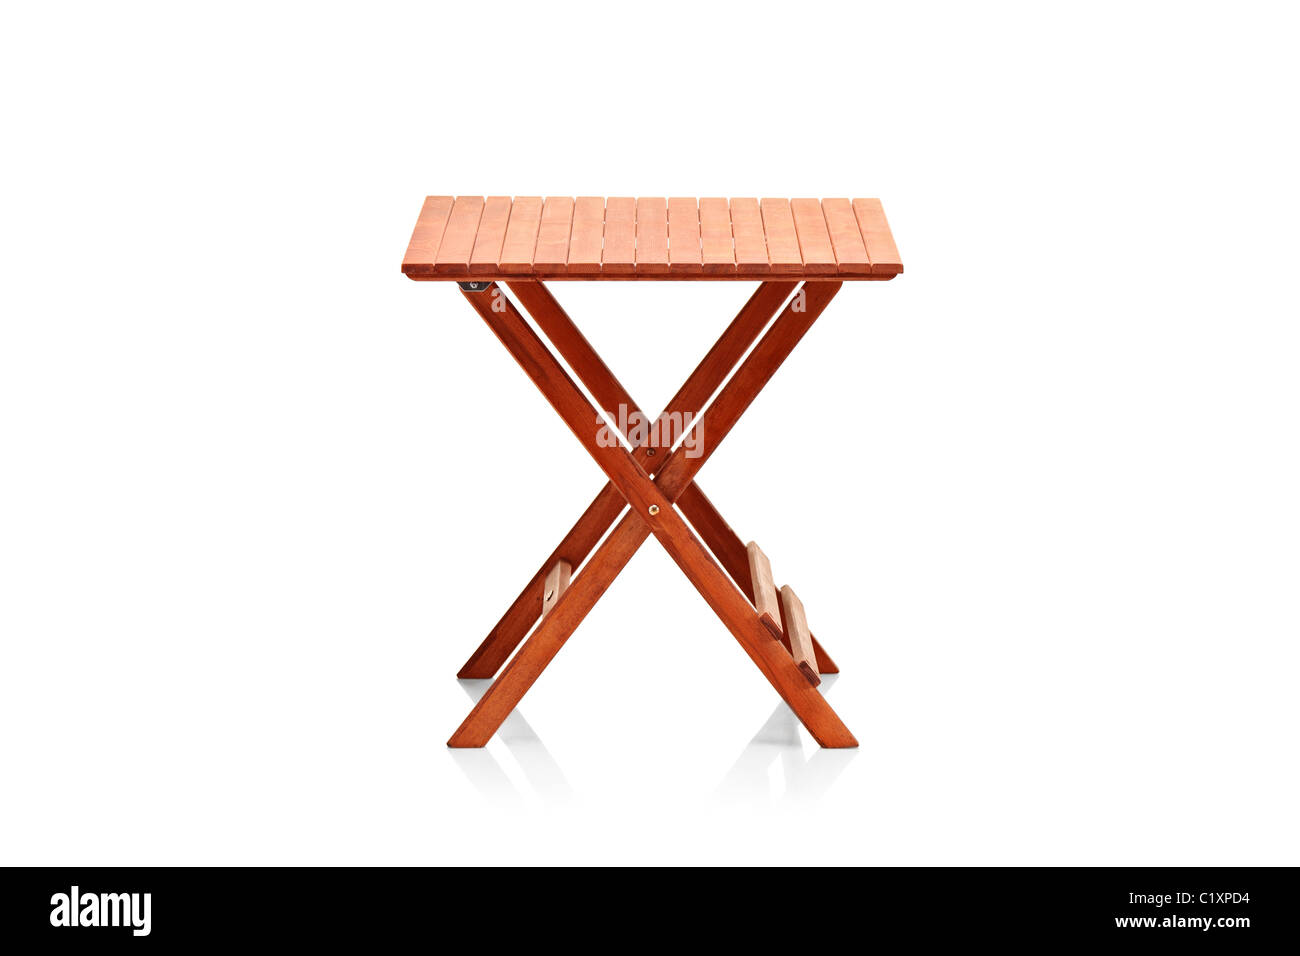 Mesa plegable de madera Imagen De Stock